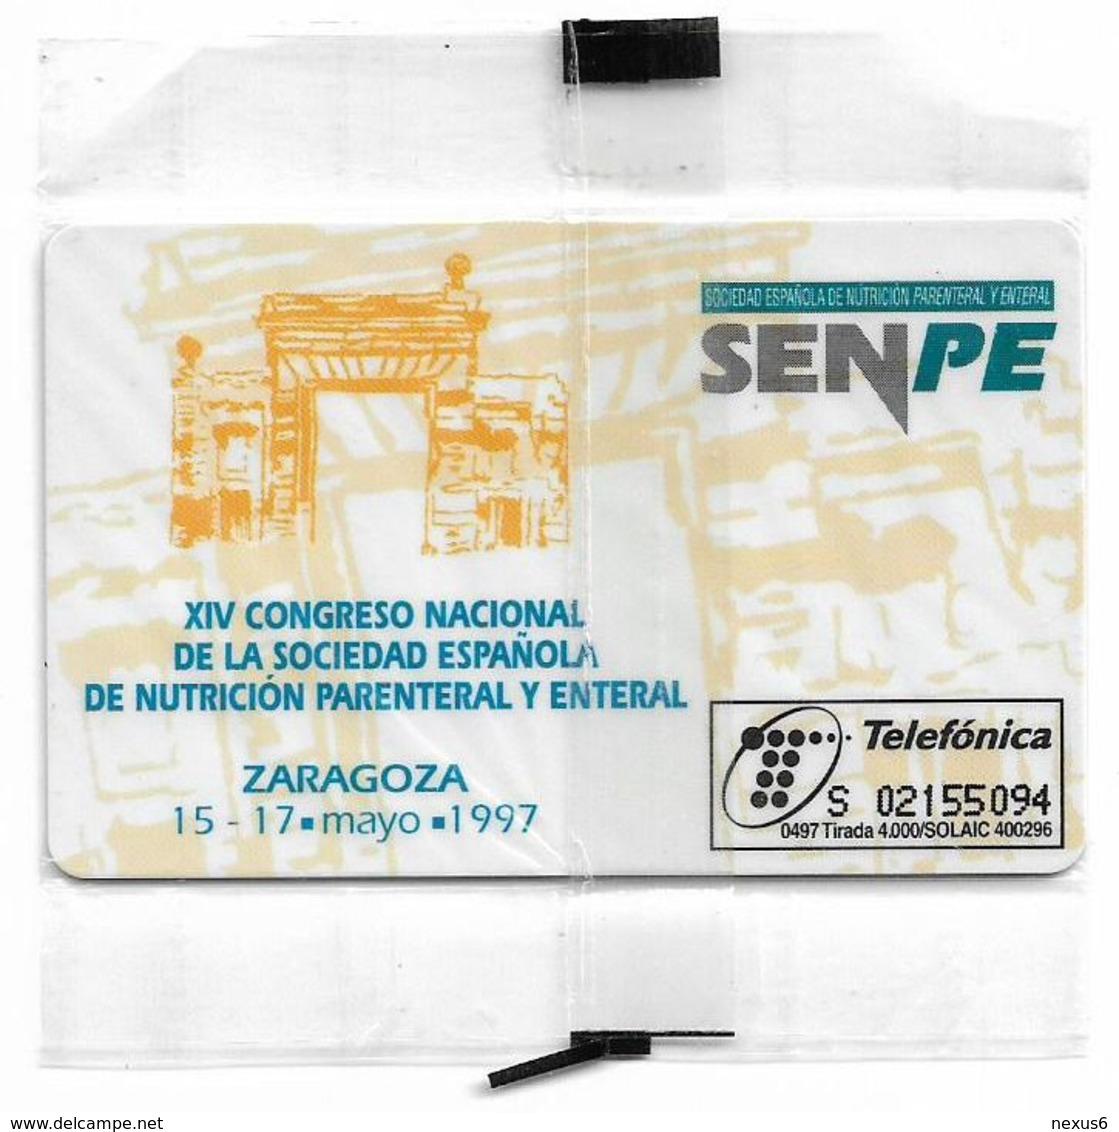 Spain - Telefónica - Clintec Baxter - P-260 - 04.1997, 500PTA, 4.000ex, NSB - España